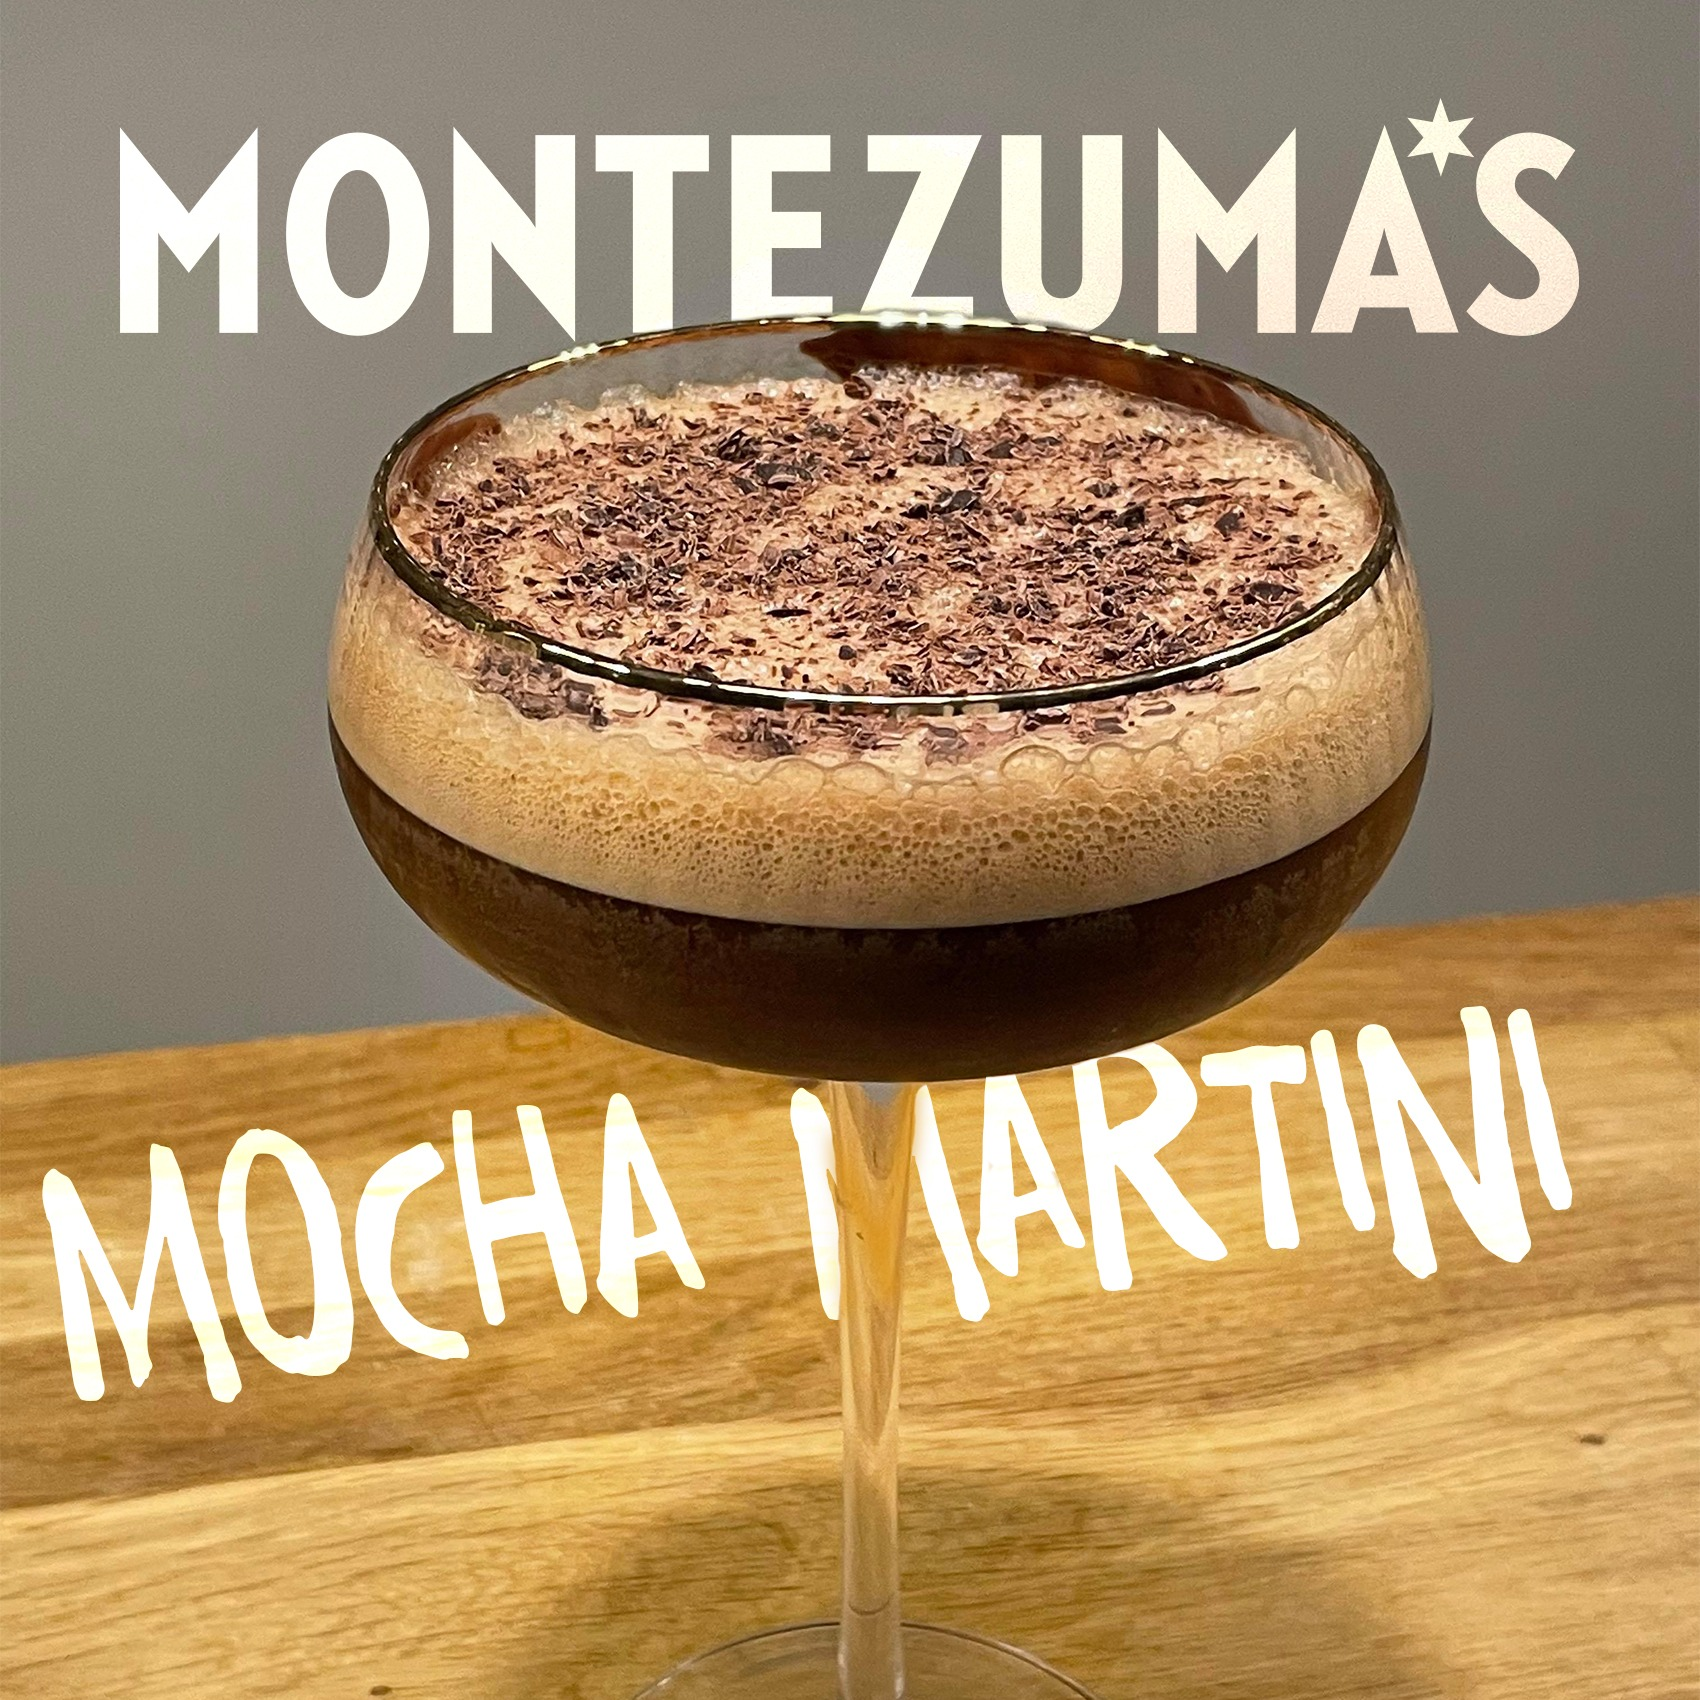 Montezuma's Mocha Martini